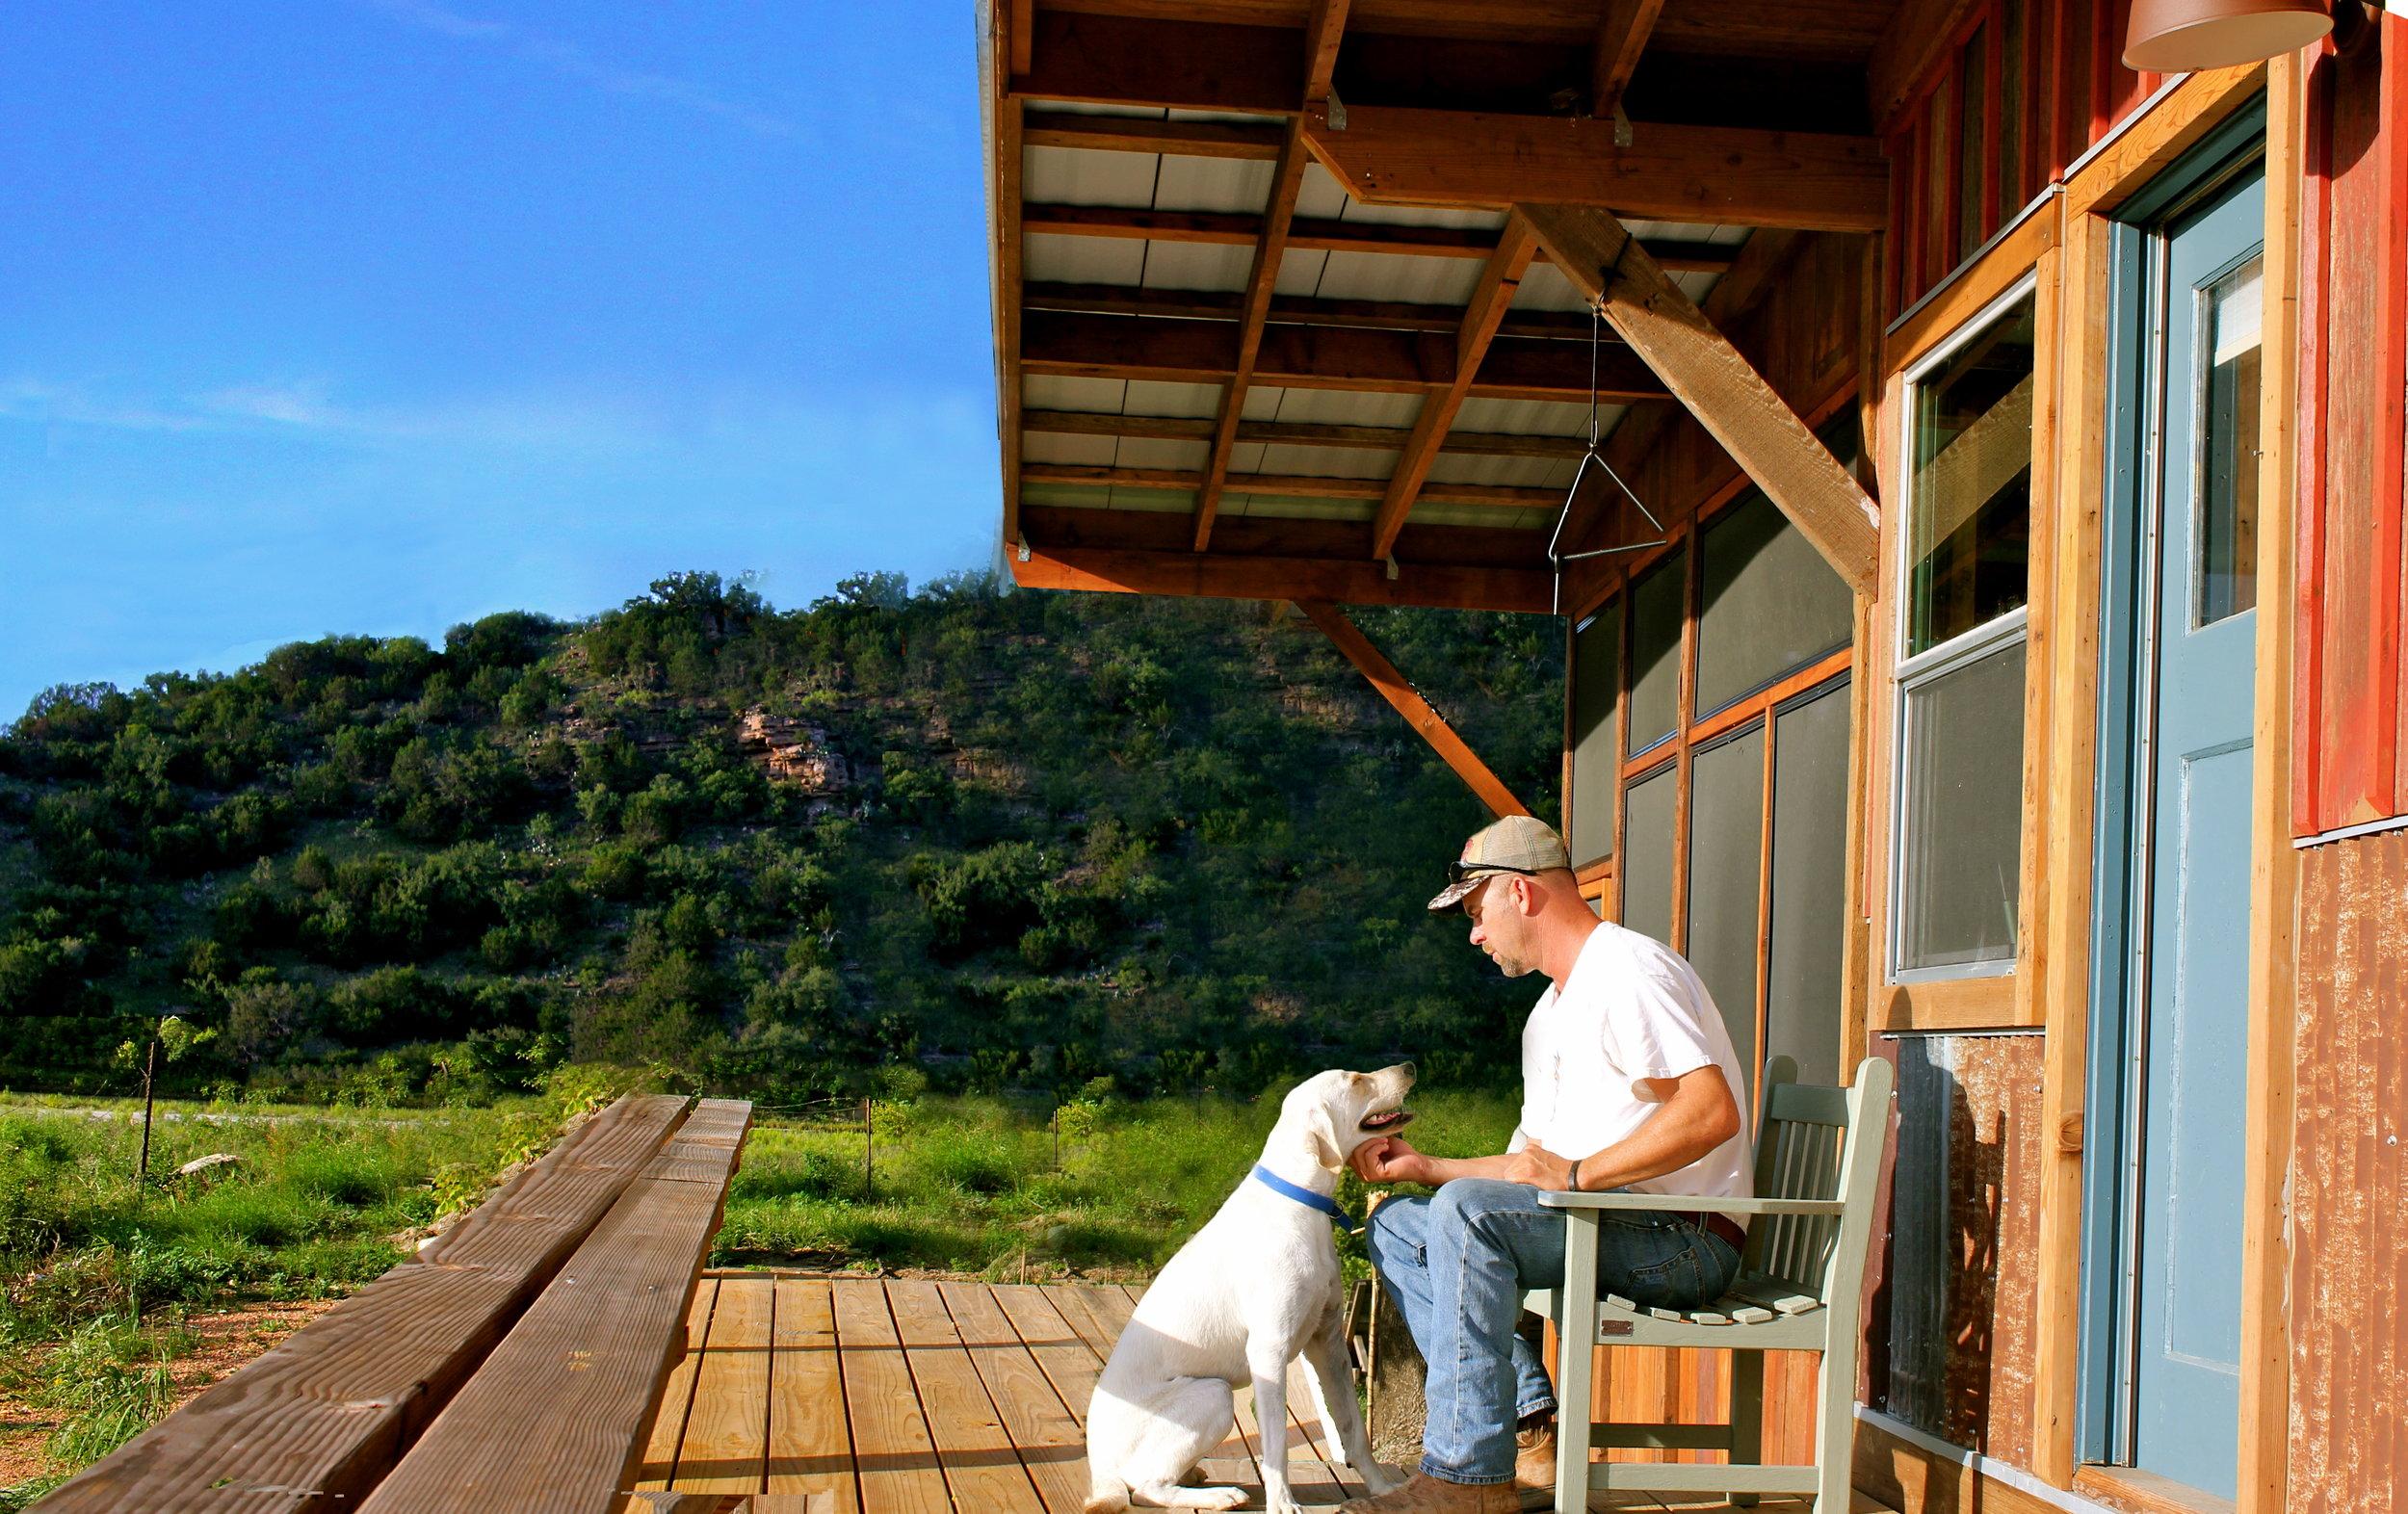 Owner Tracen Gardner and his K9 Lyla